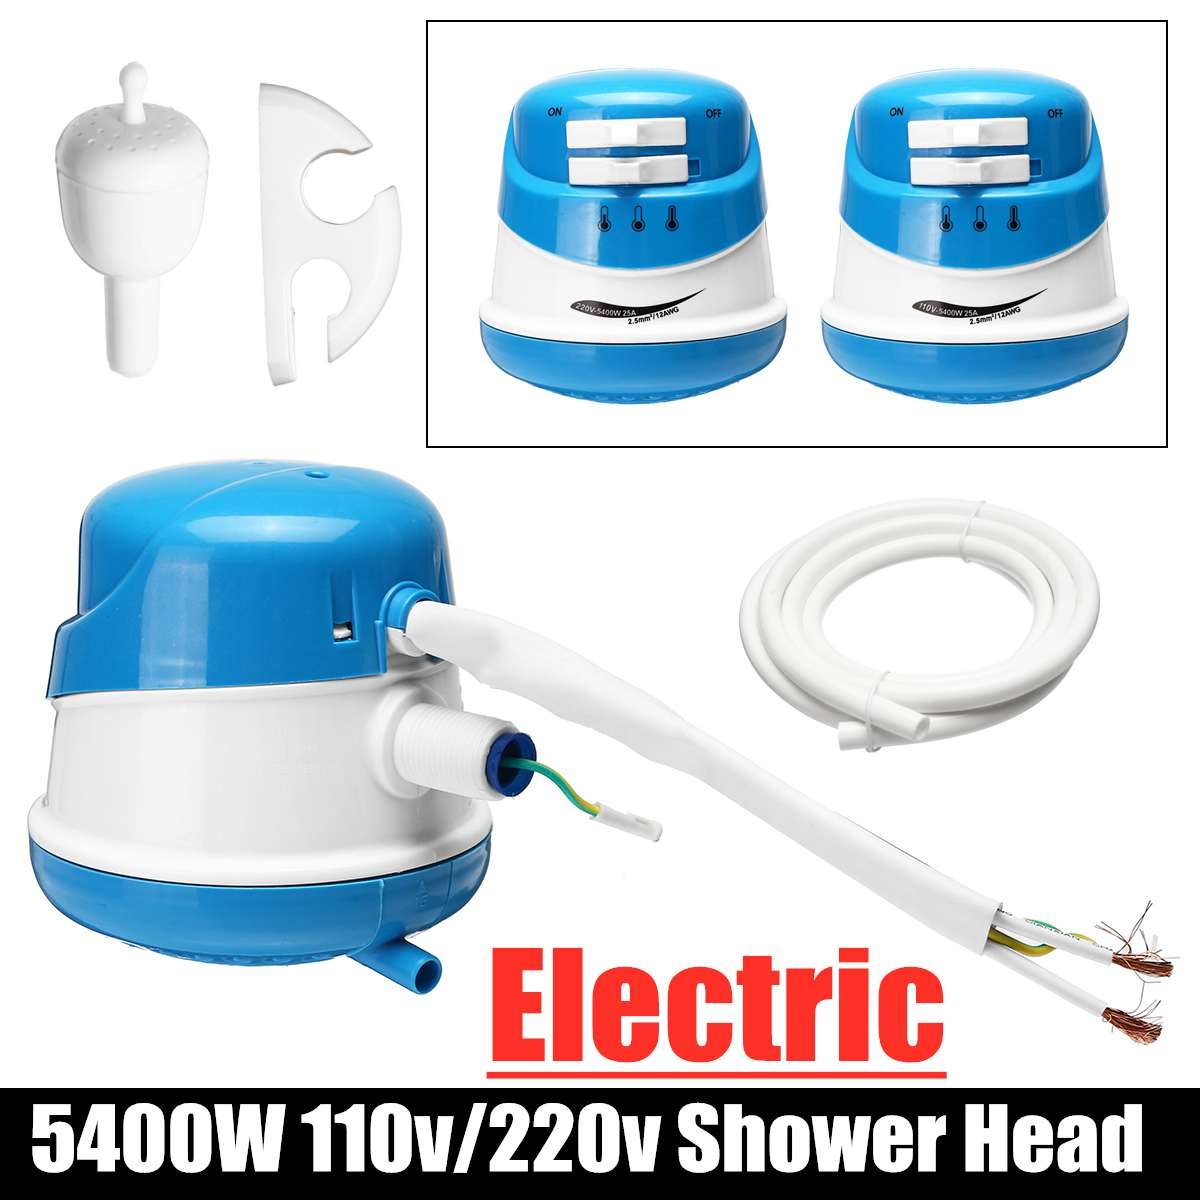 5400W Hot Water Heater Shower Heater Faucet Instant Hot Water Tap Shower Tankless Electric Faucet Instantaneous Bathroom